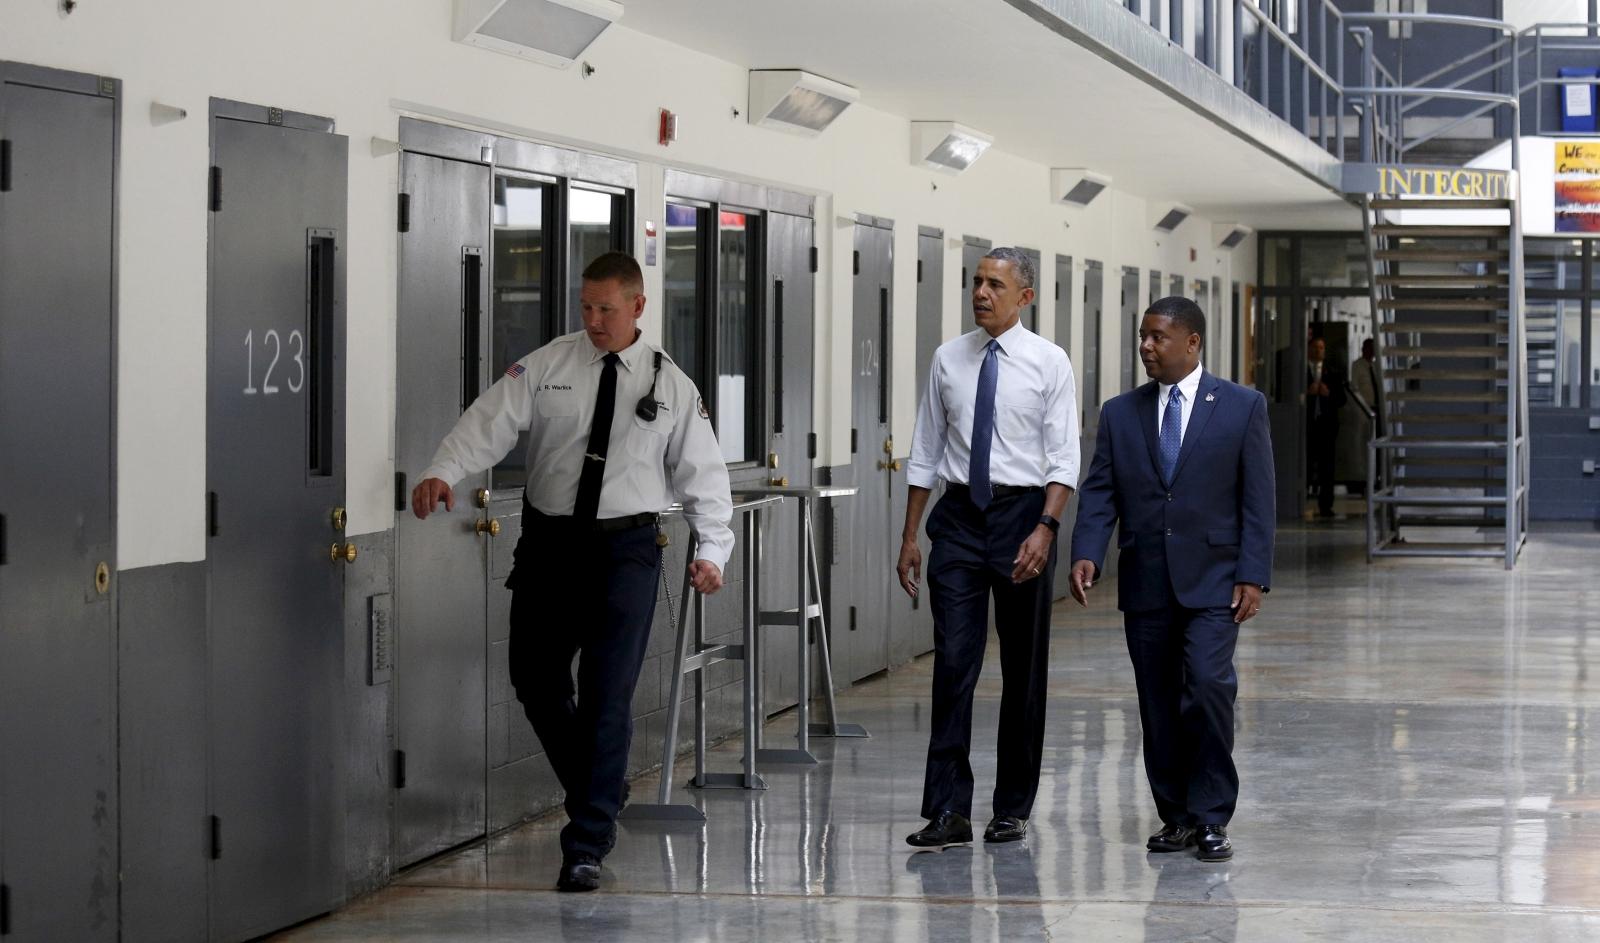 President Obama visits prison